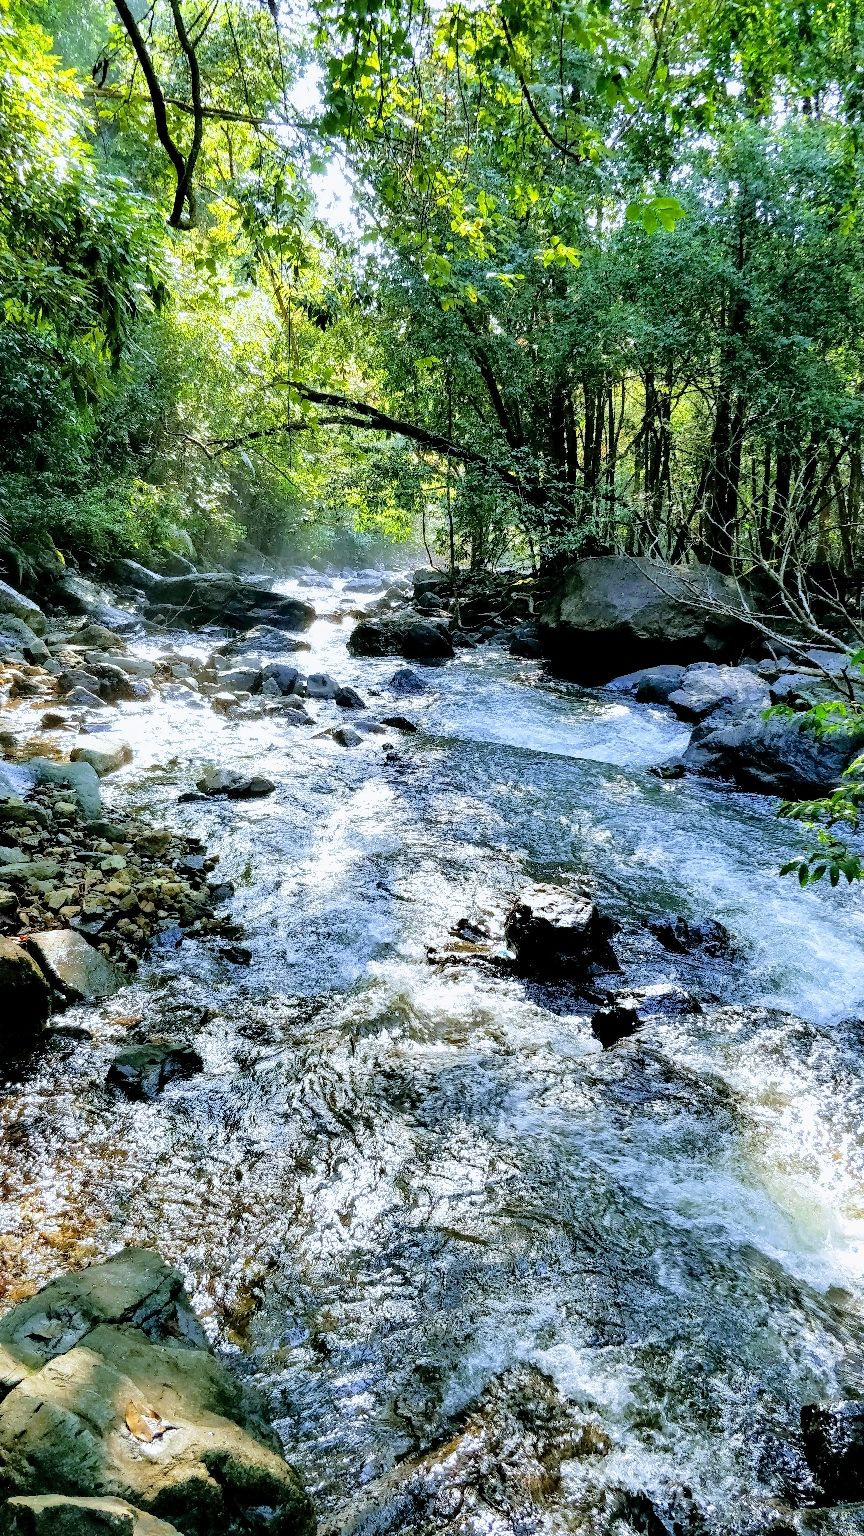 Photo of Dudhsagar Falls By lalit akhade